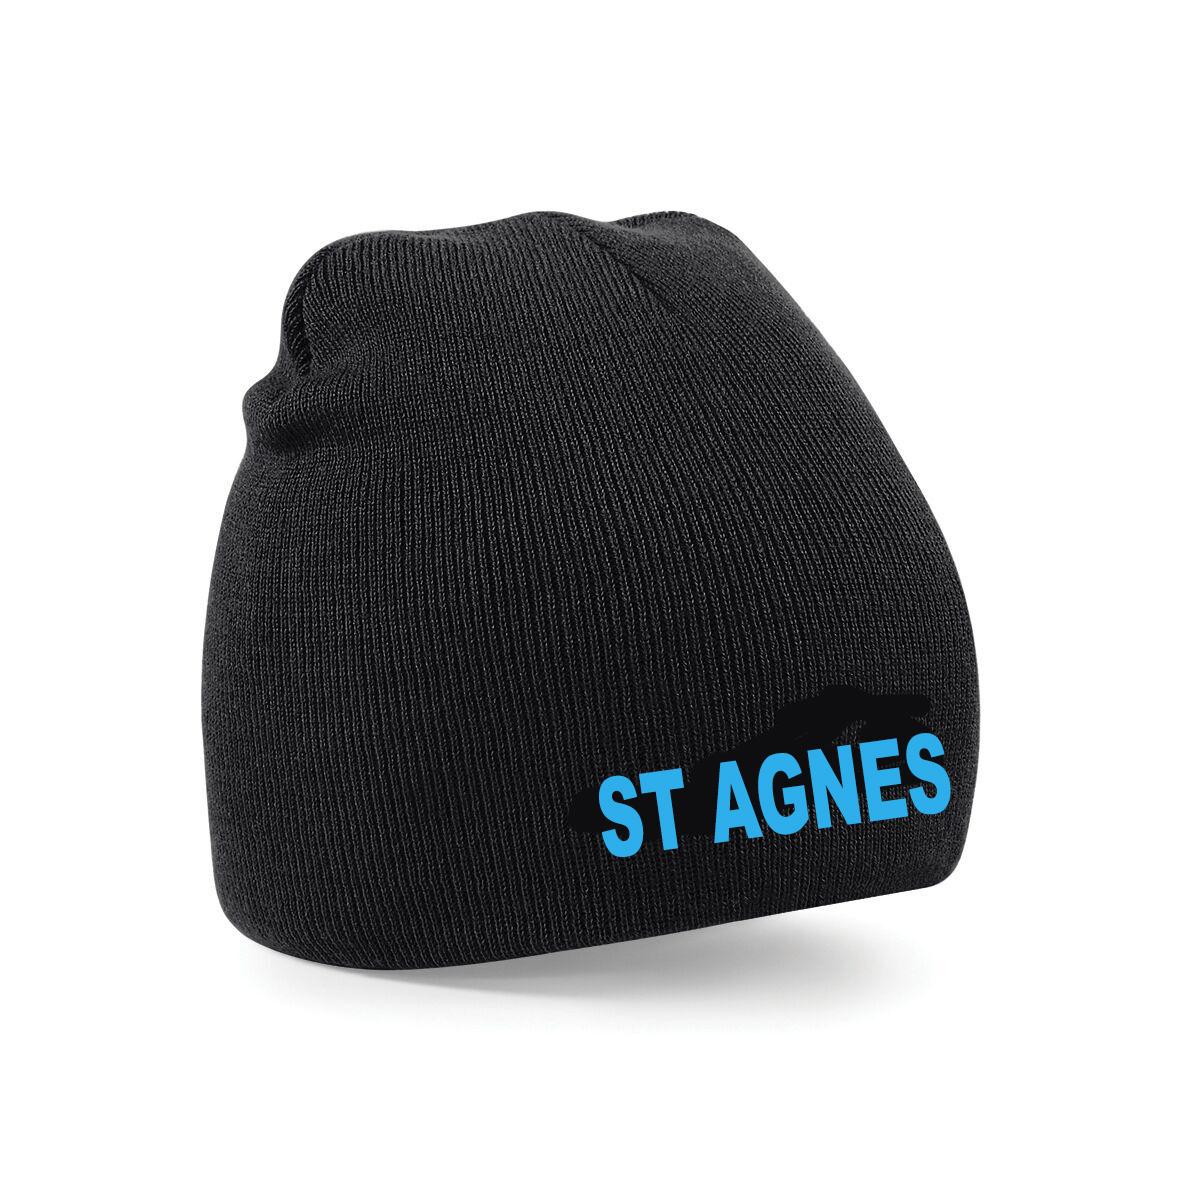 ST AGNES BEANIE